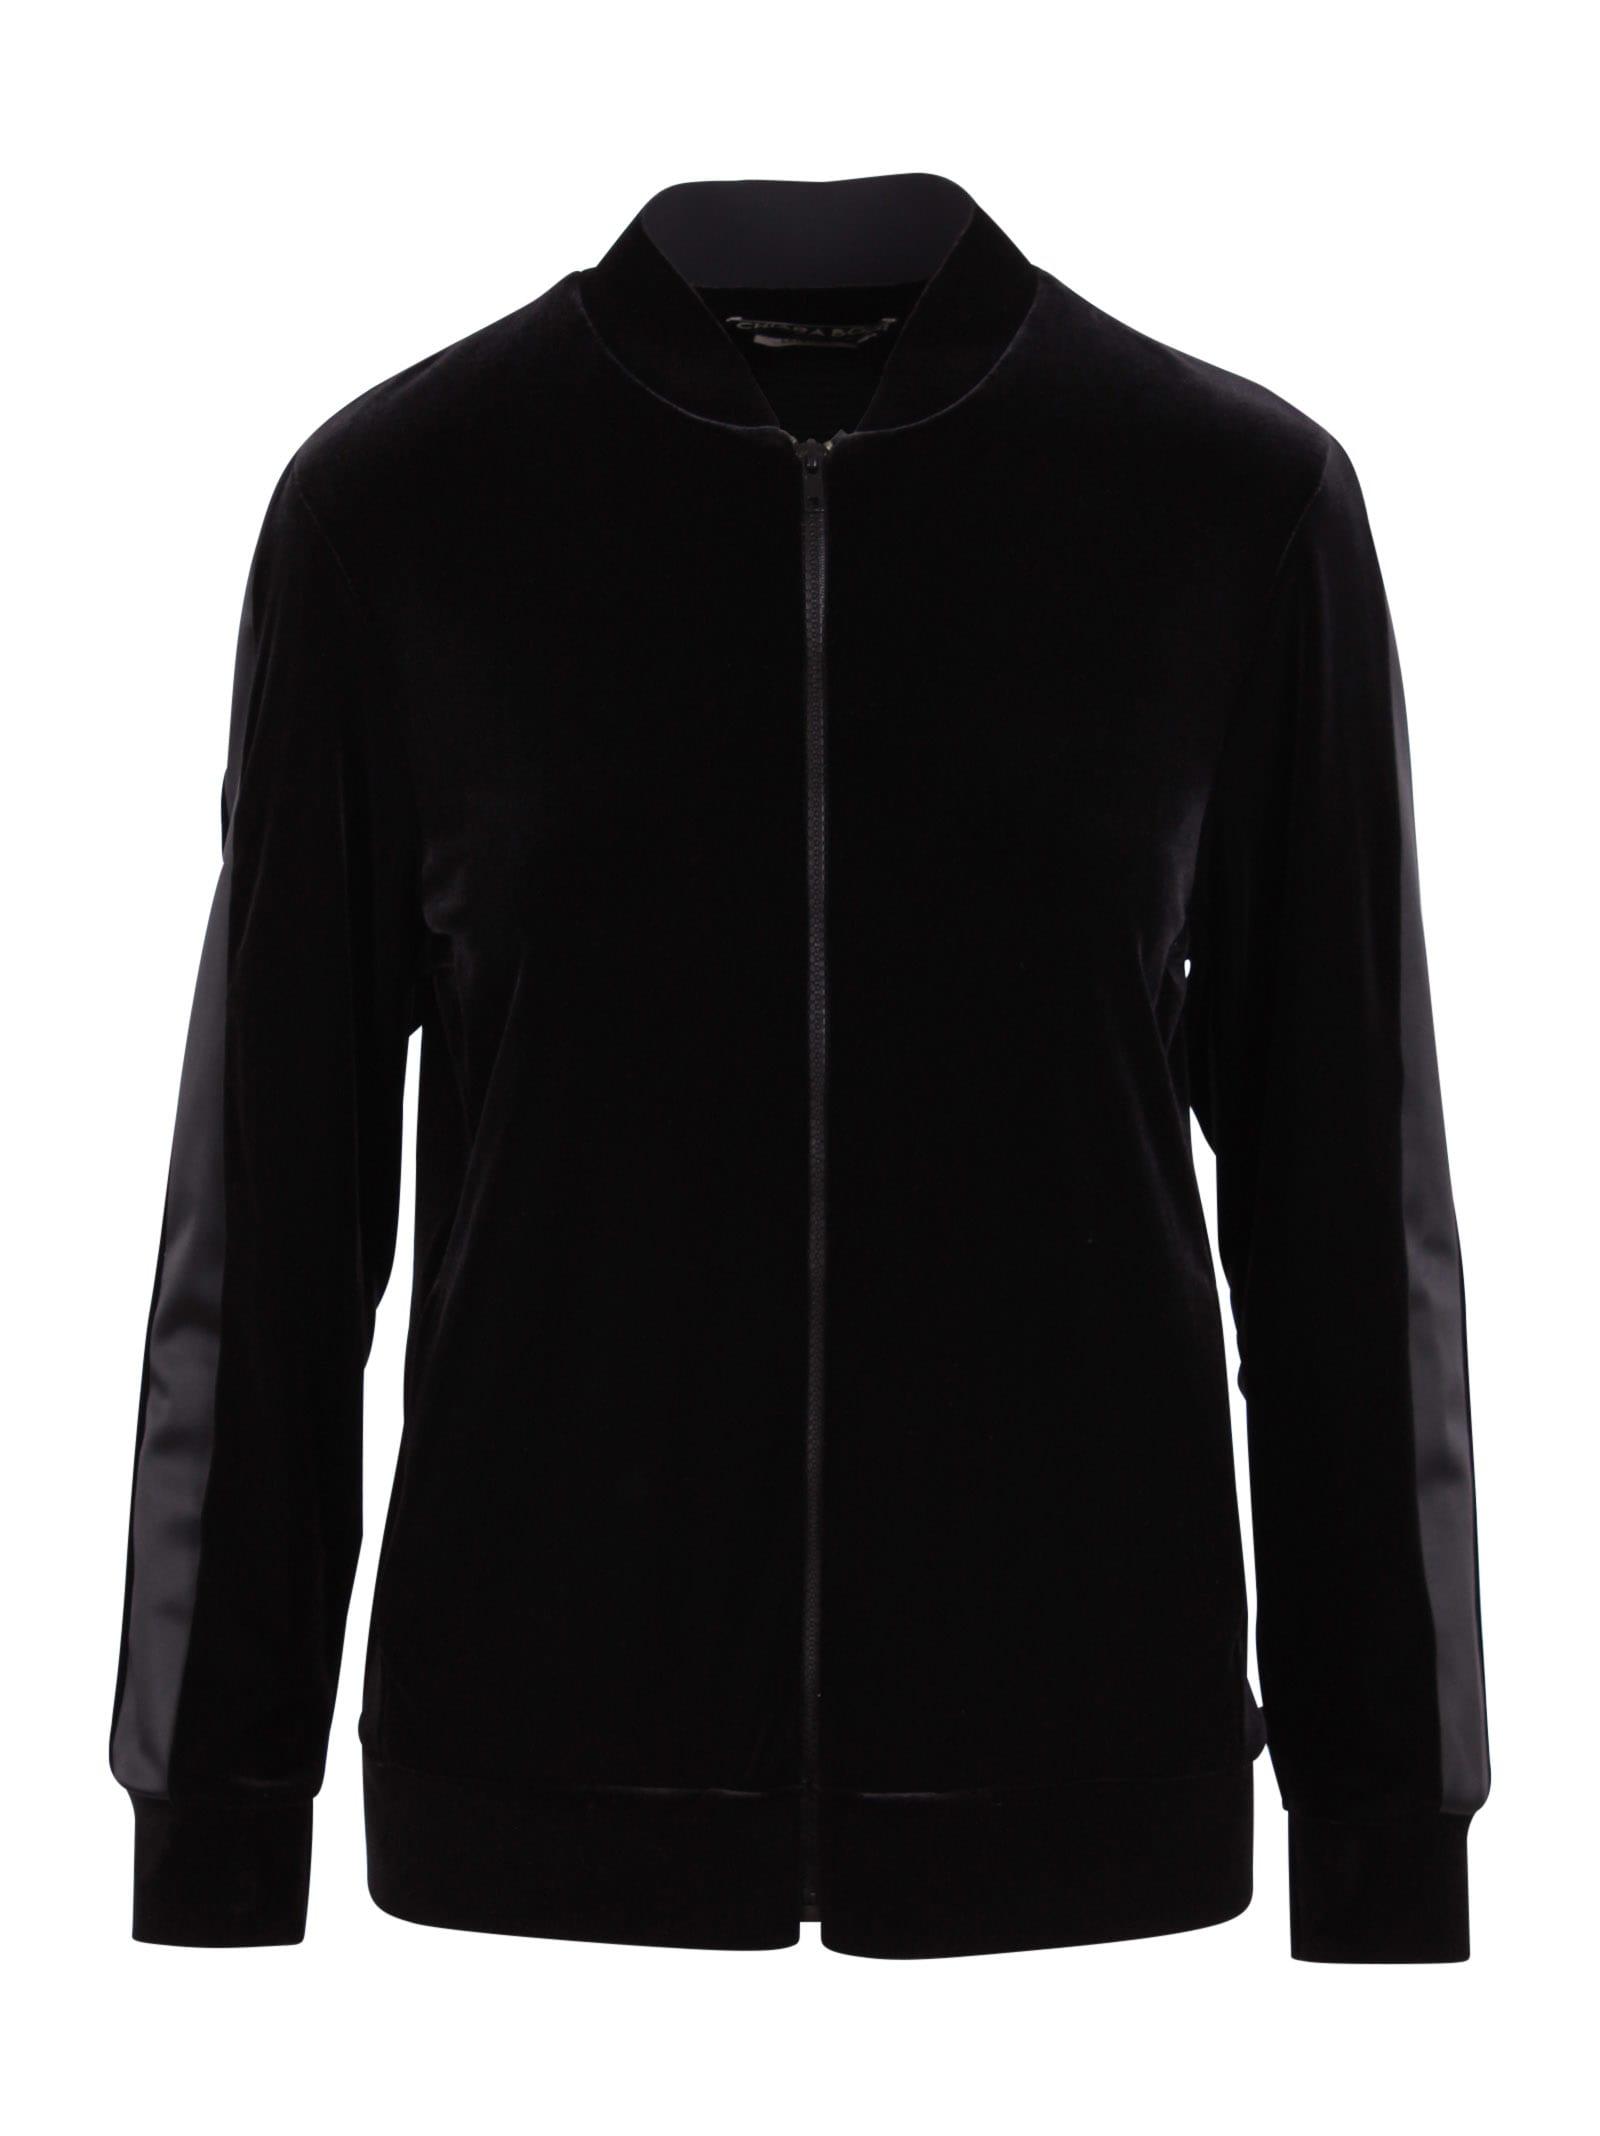 Le Petite Robe Di Chiara Boni mukkadder Polyester Sweatshirt